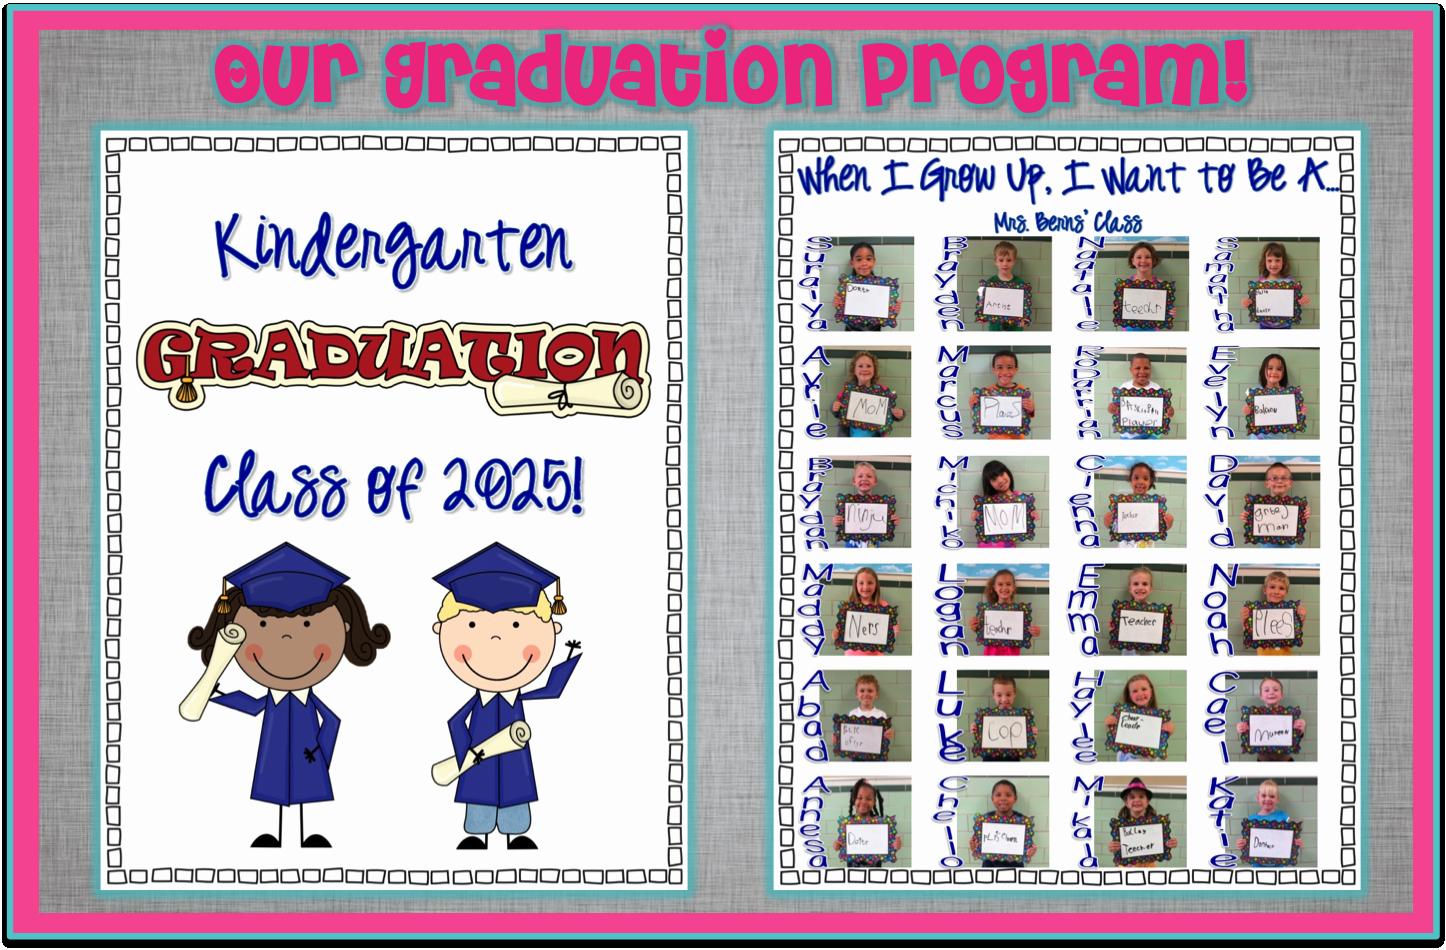 Preschool Graduation Programs Template Awesome Preschool Graduation Program Sample Google Search